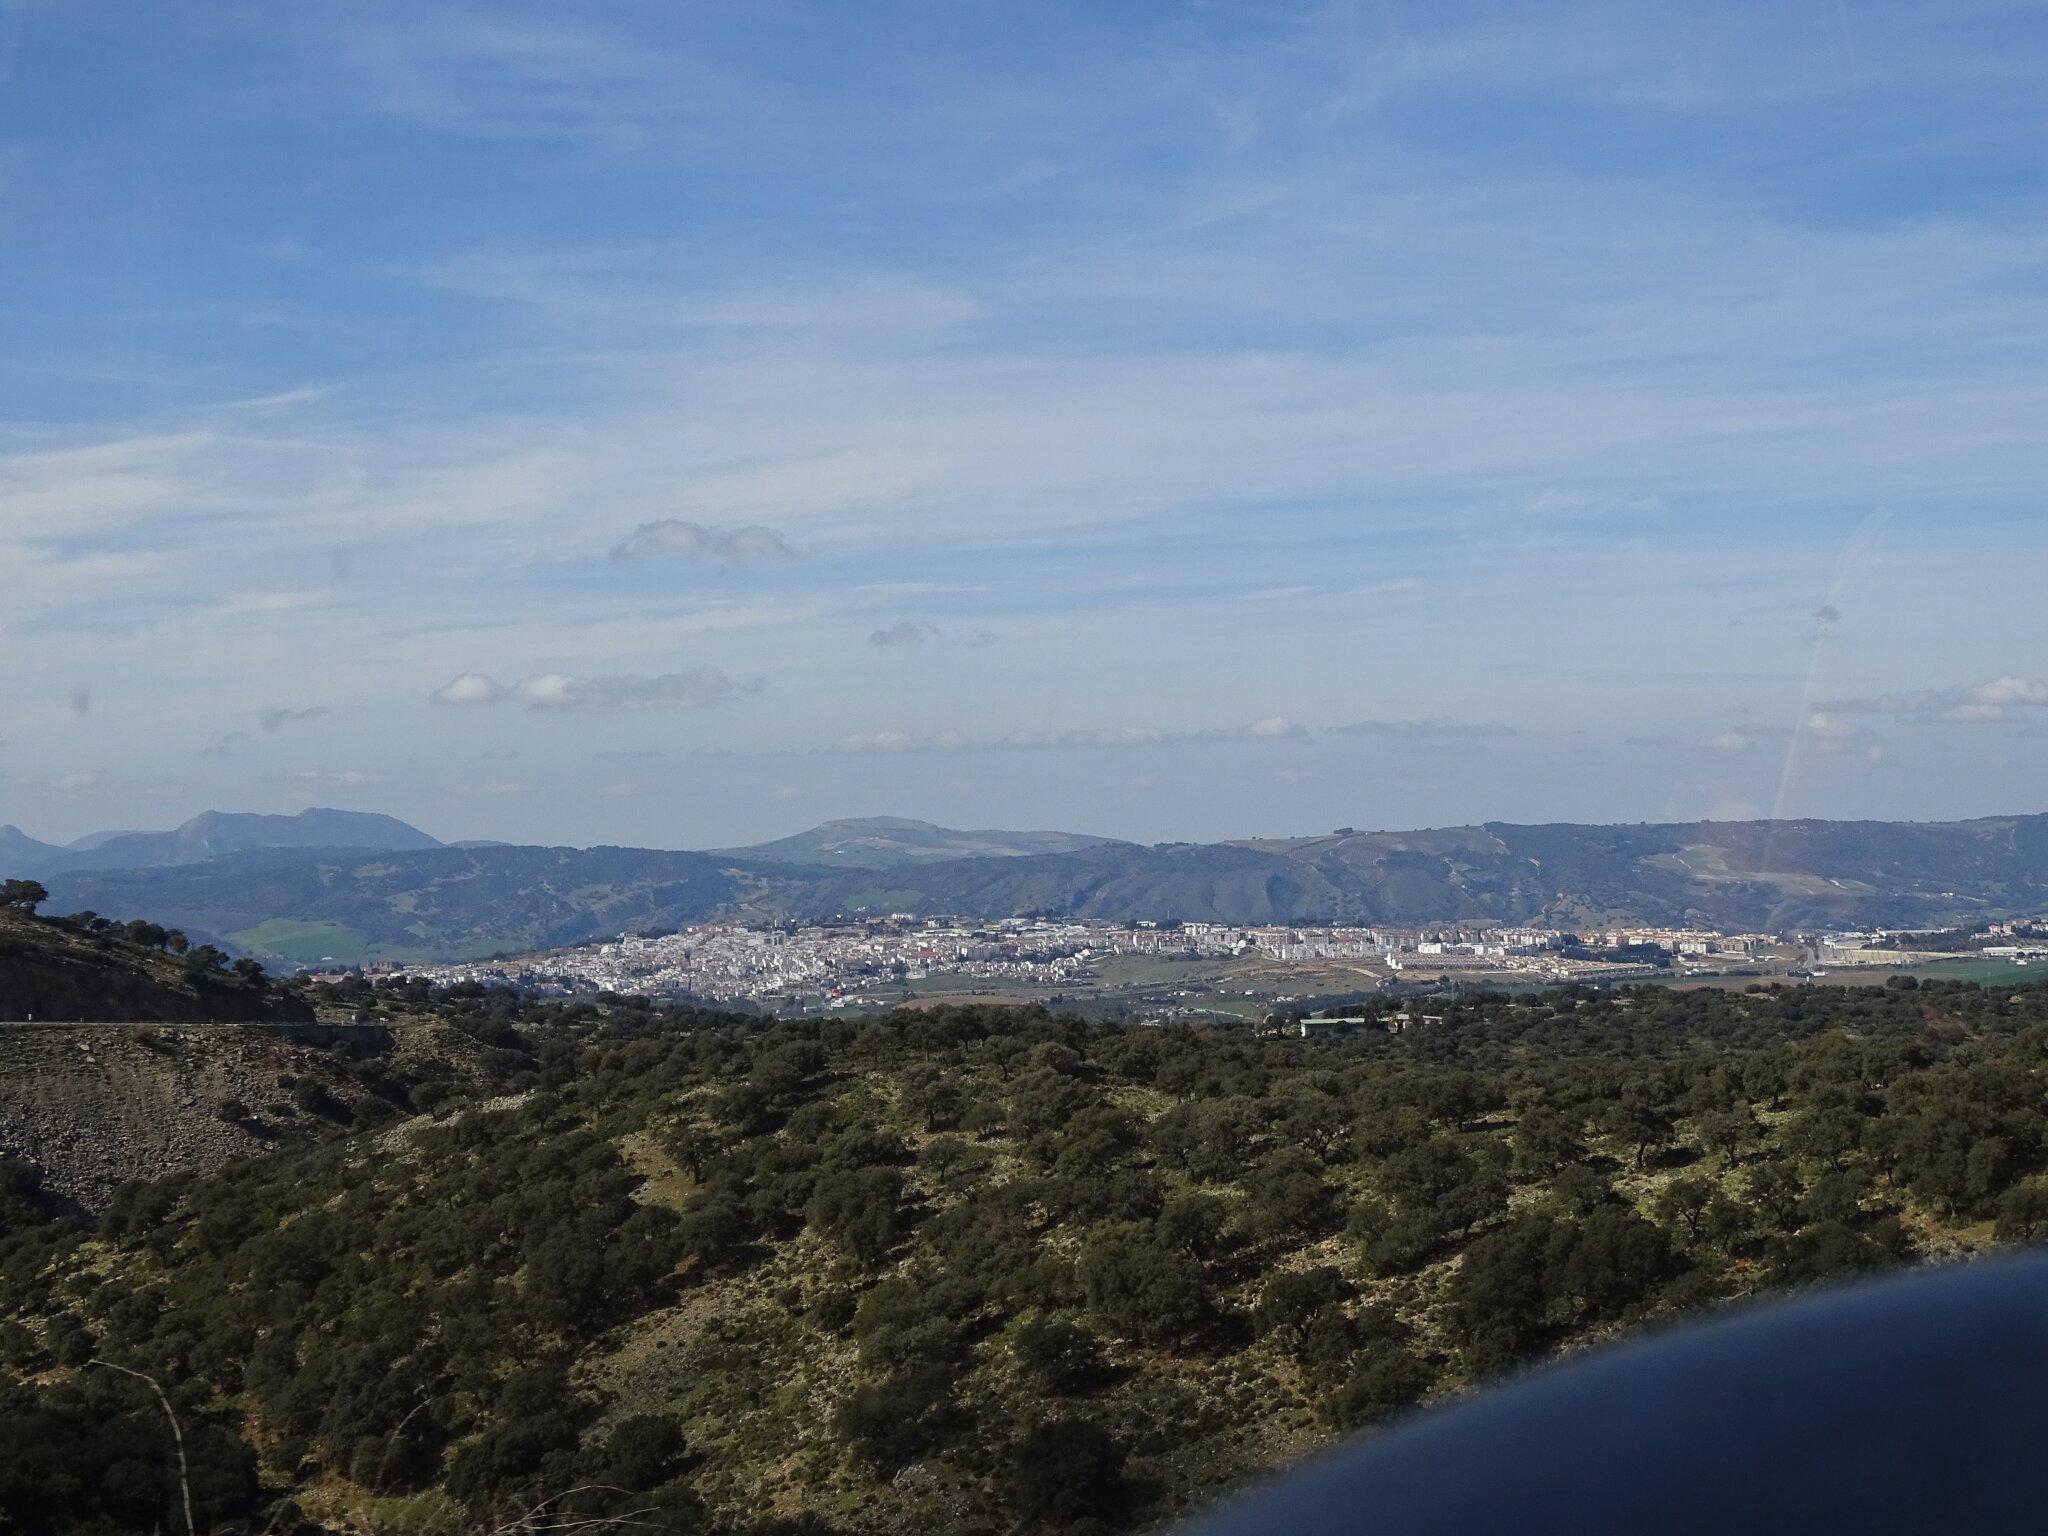 2016-03-17_15-37-28_ vers Marbella